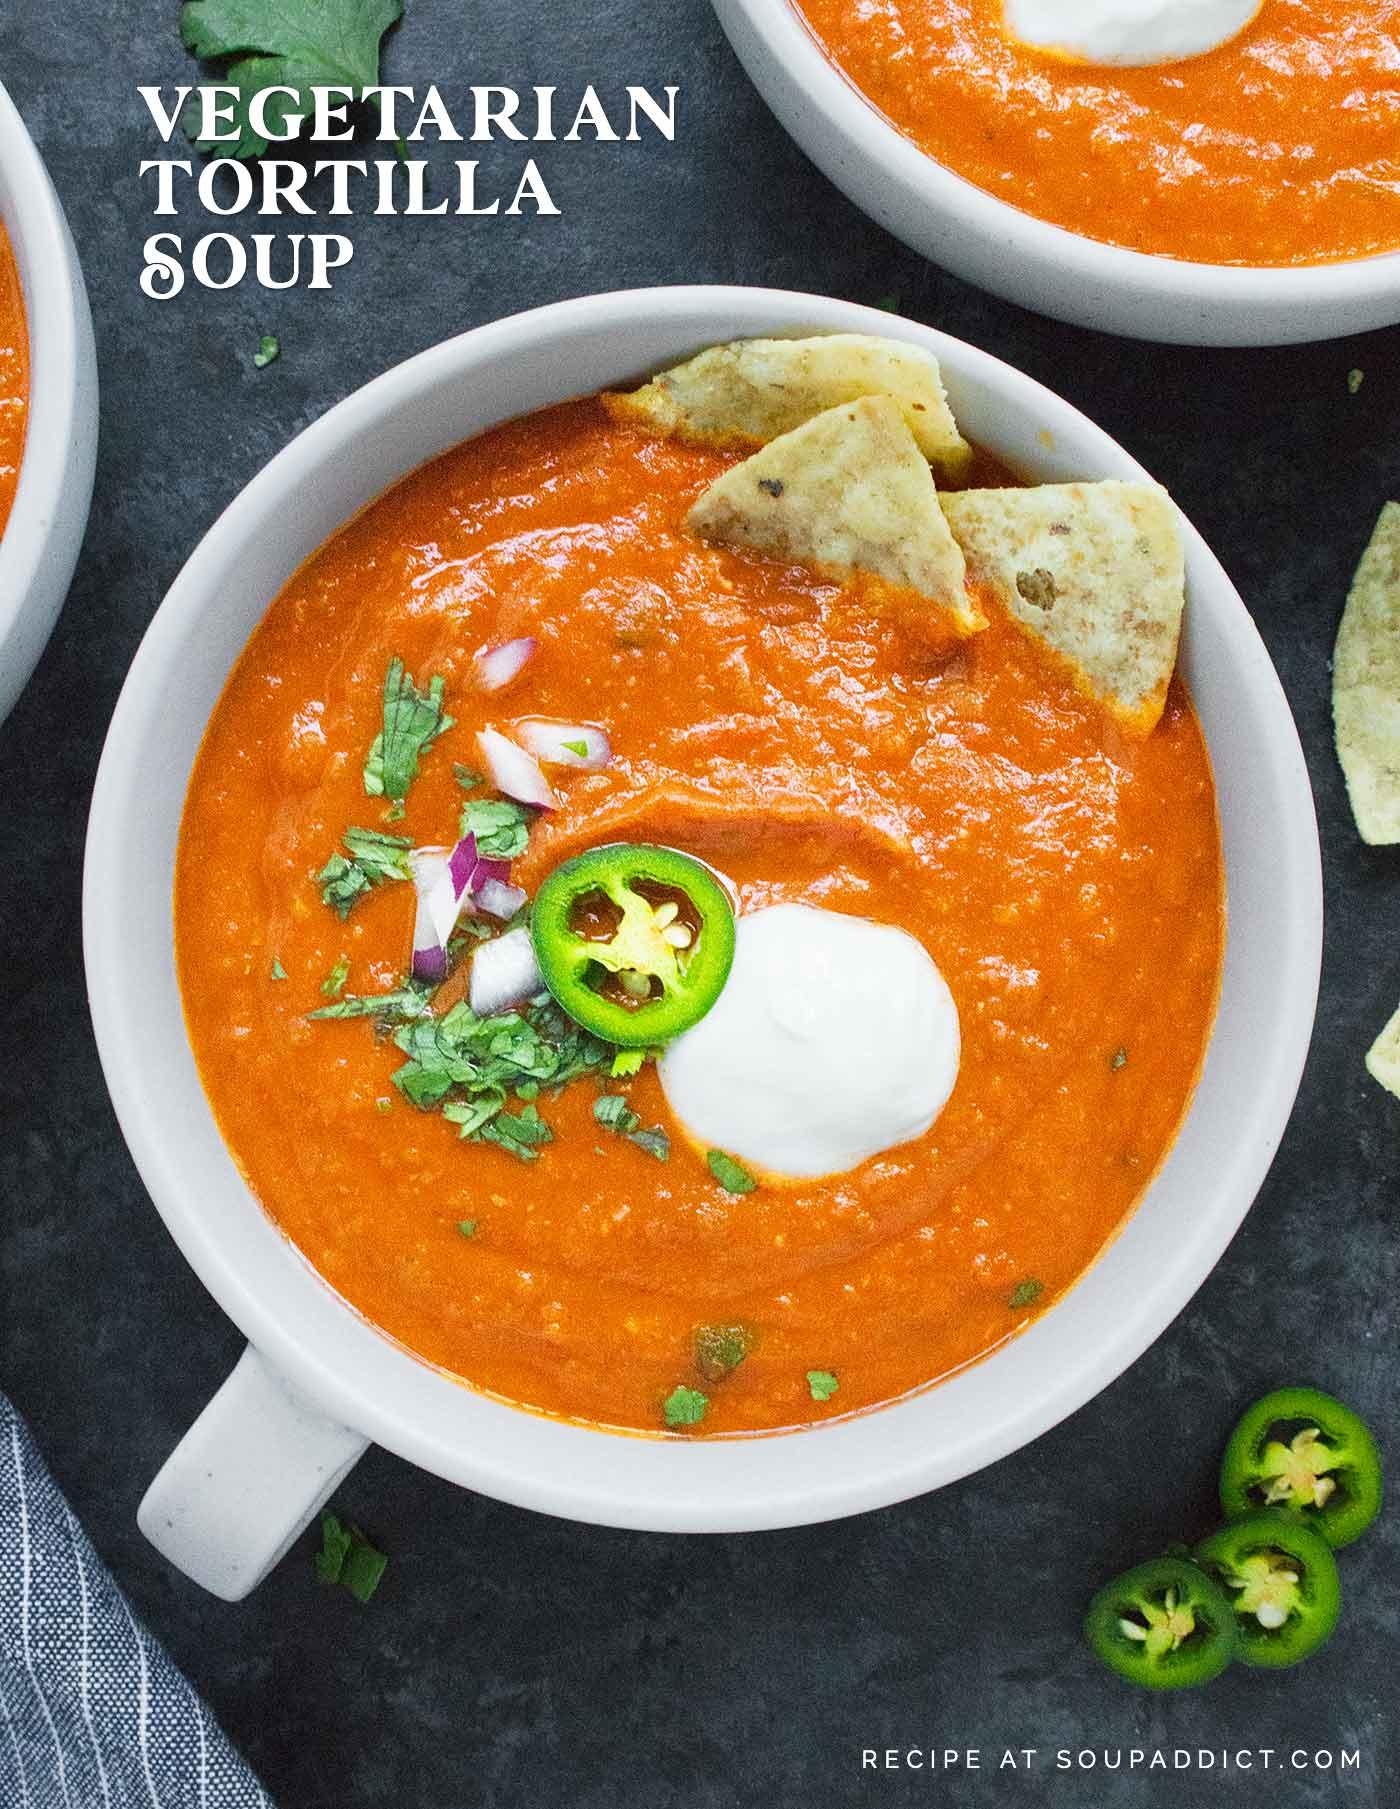 Close-up of a bowl of Vegetarian Tortilla Soup